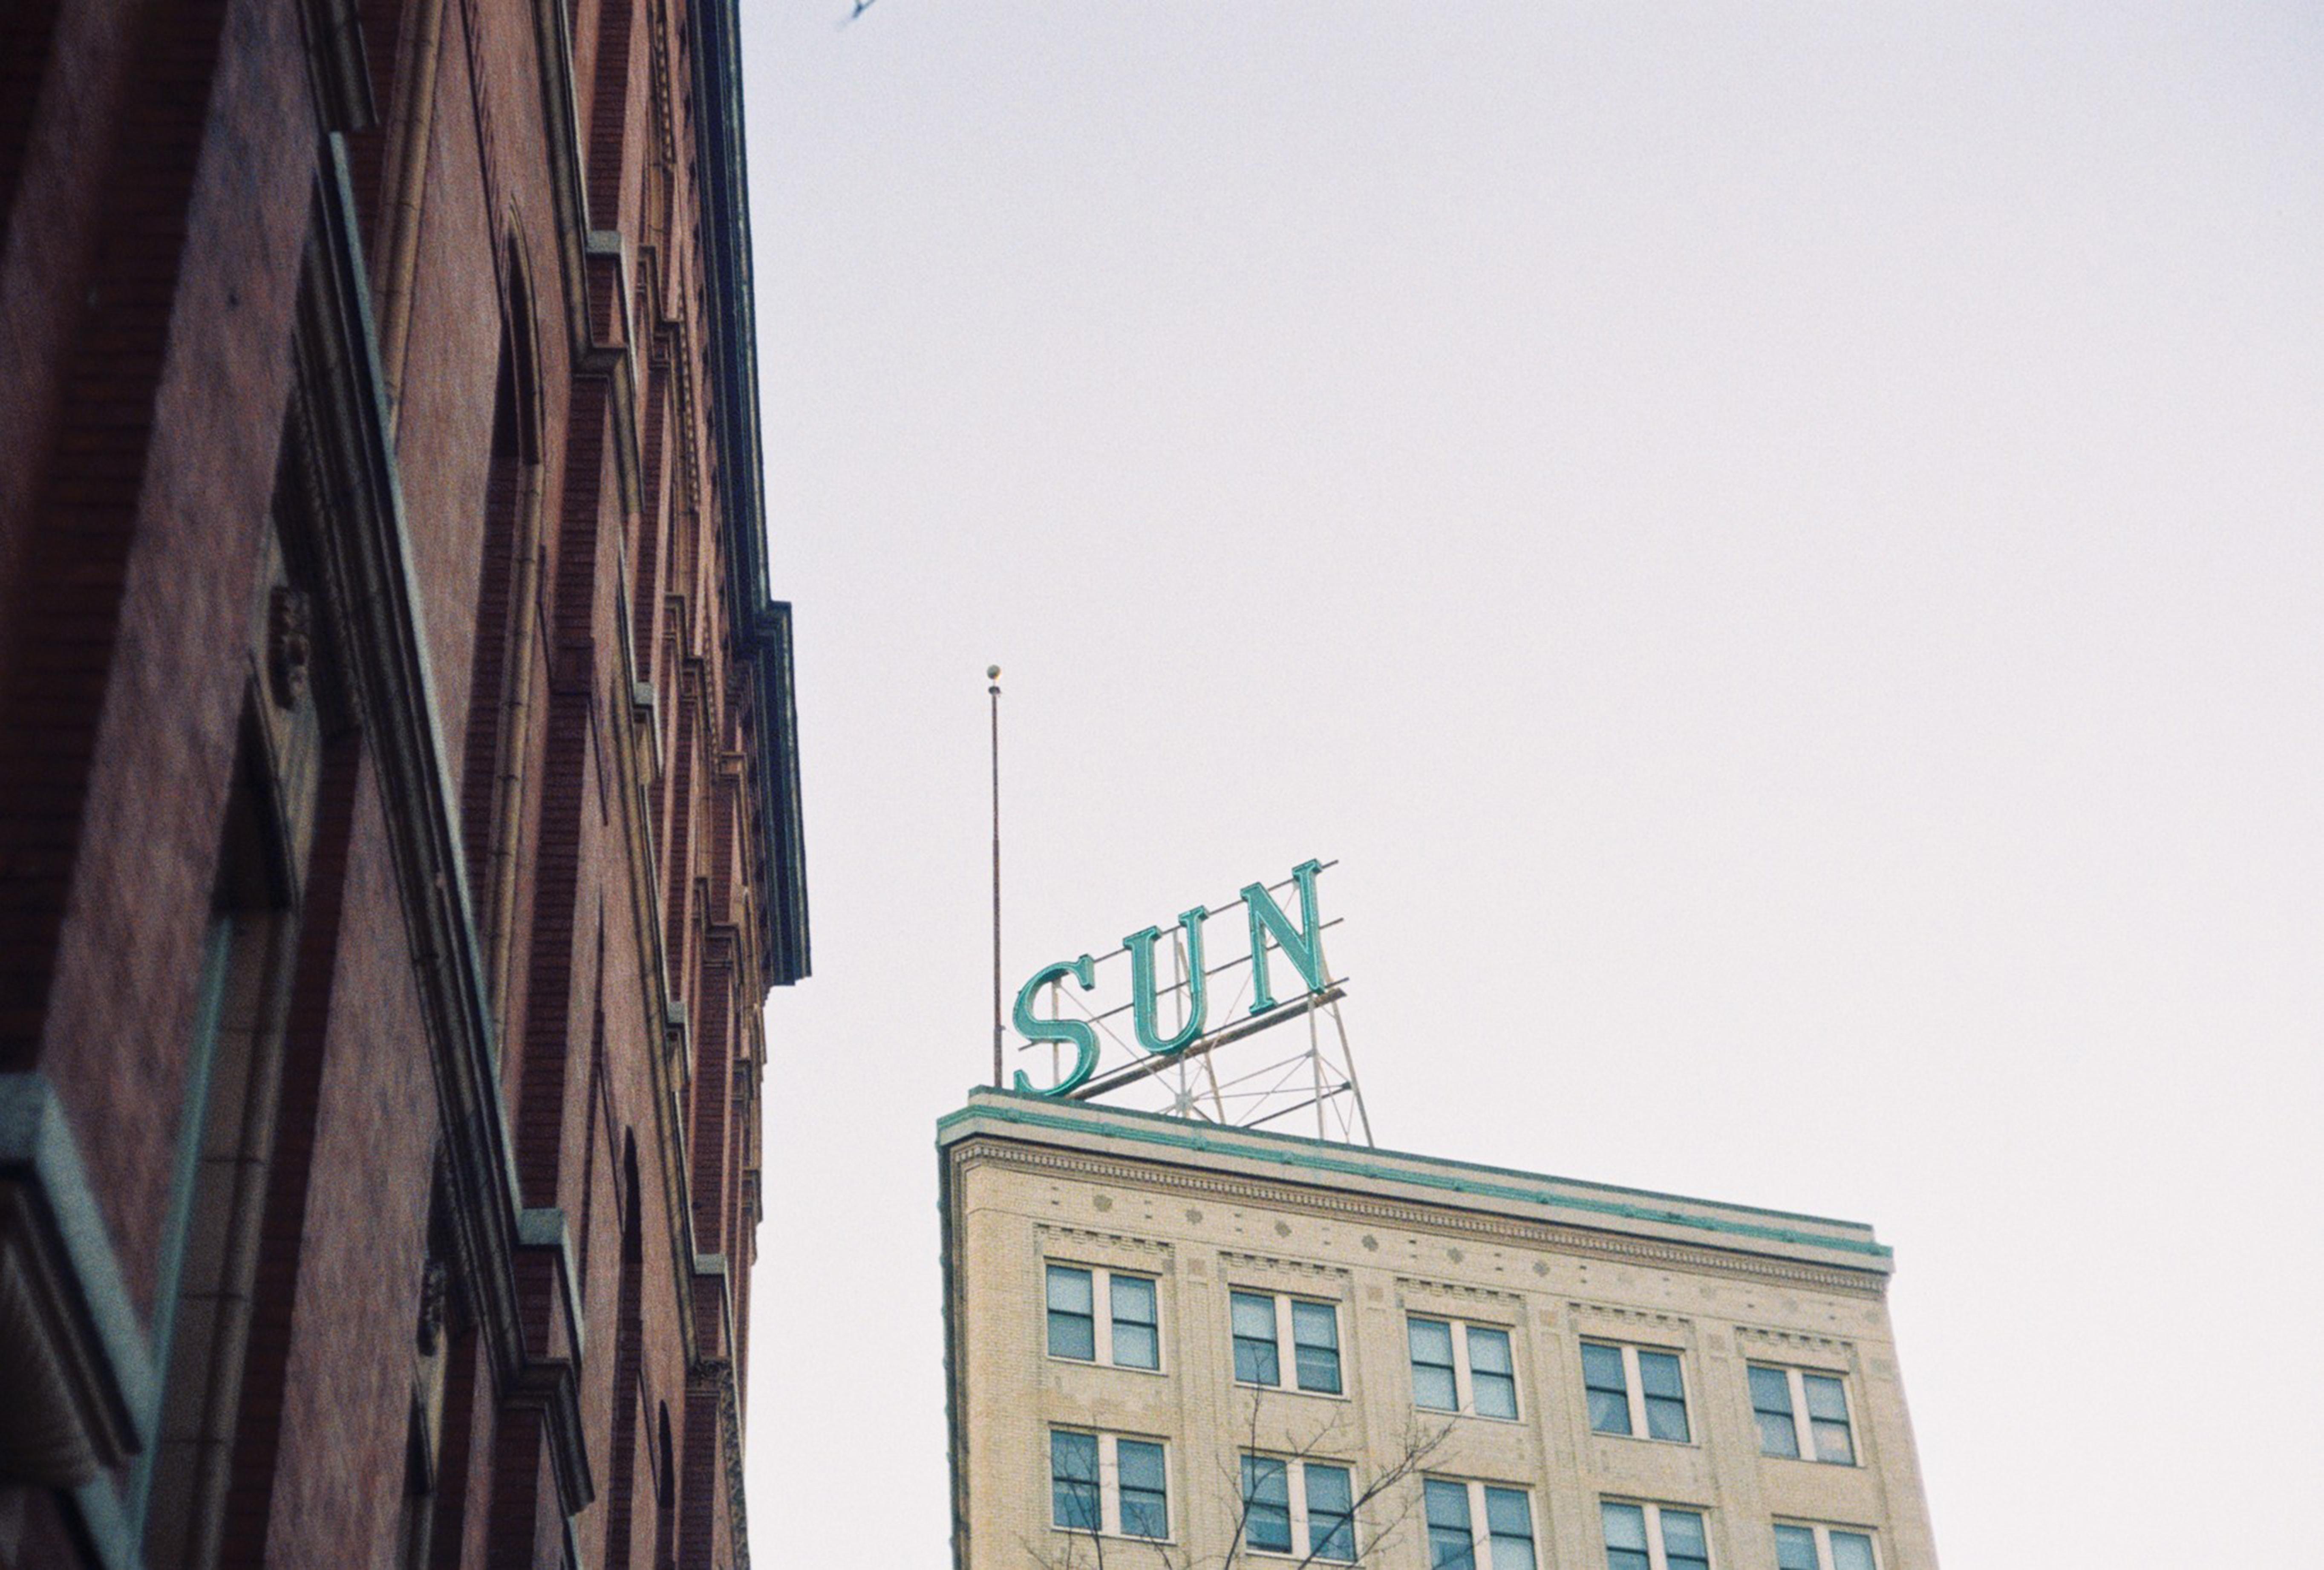 Sun signage